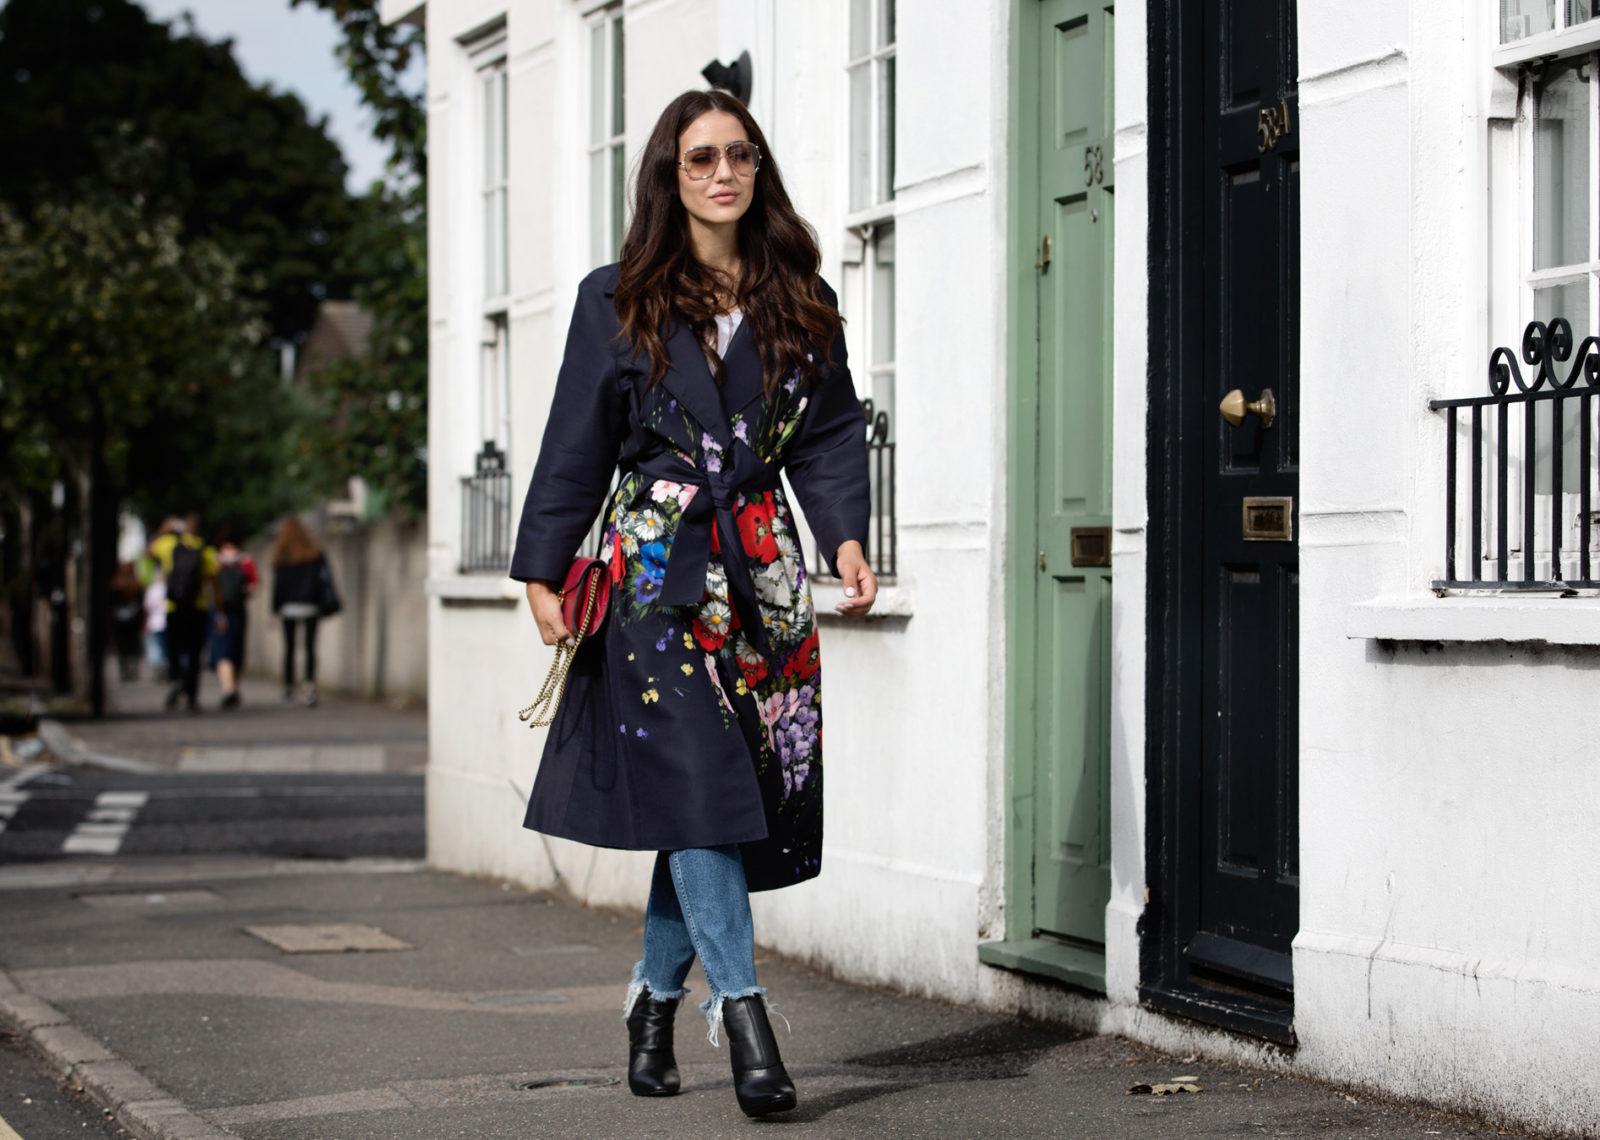 londonblogger1